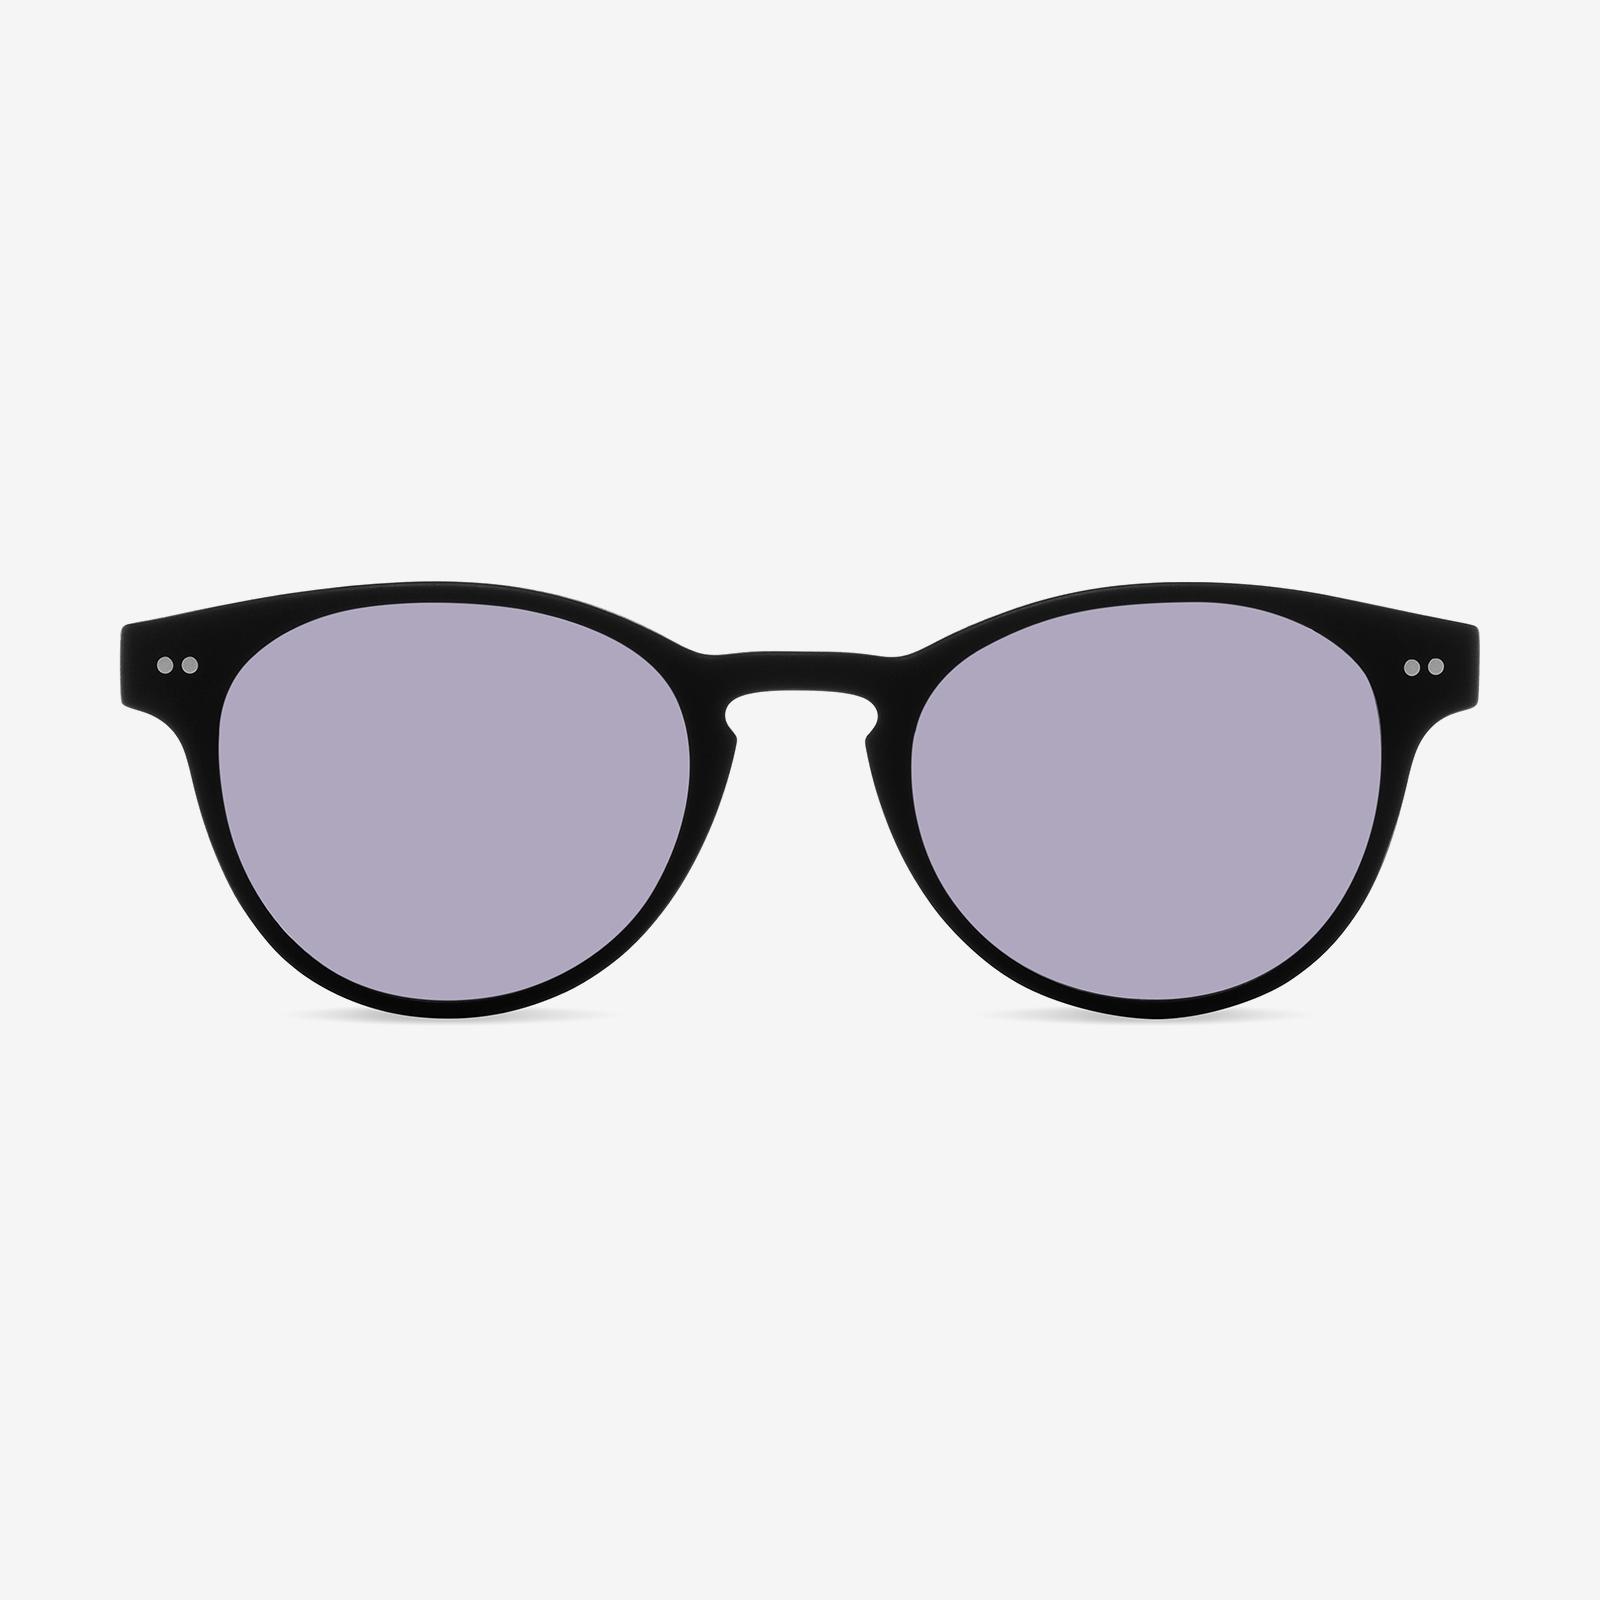 sunglasses product photo, goggles product photo